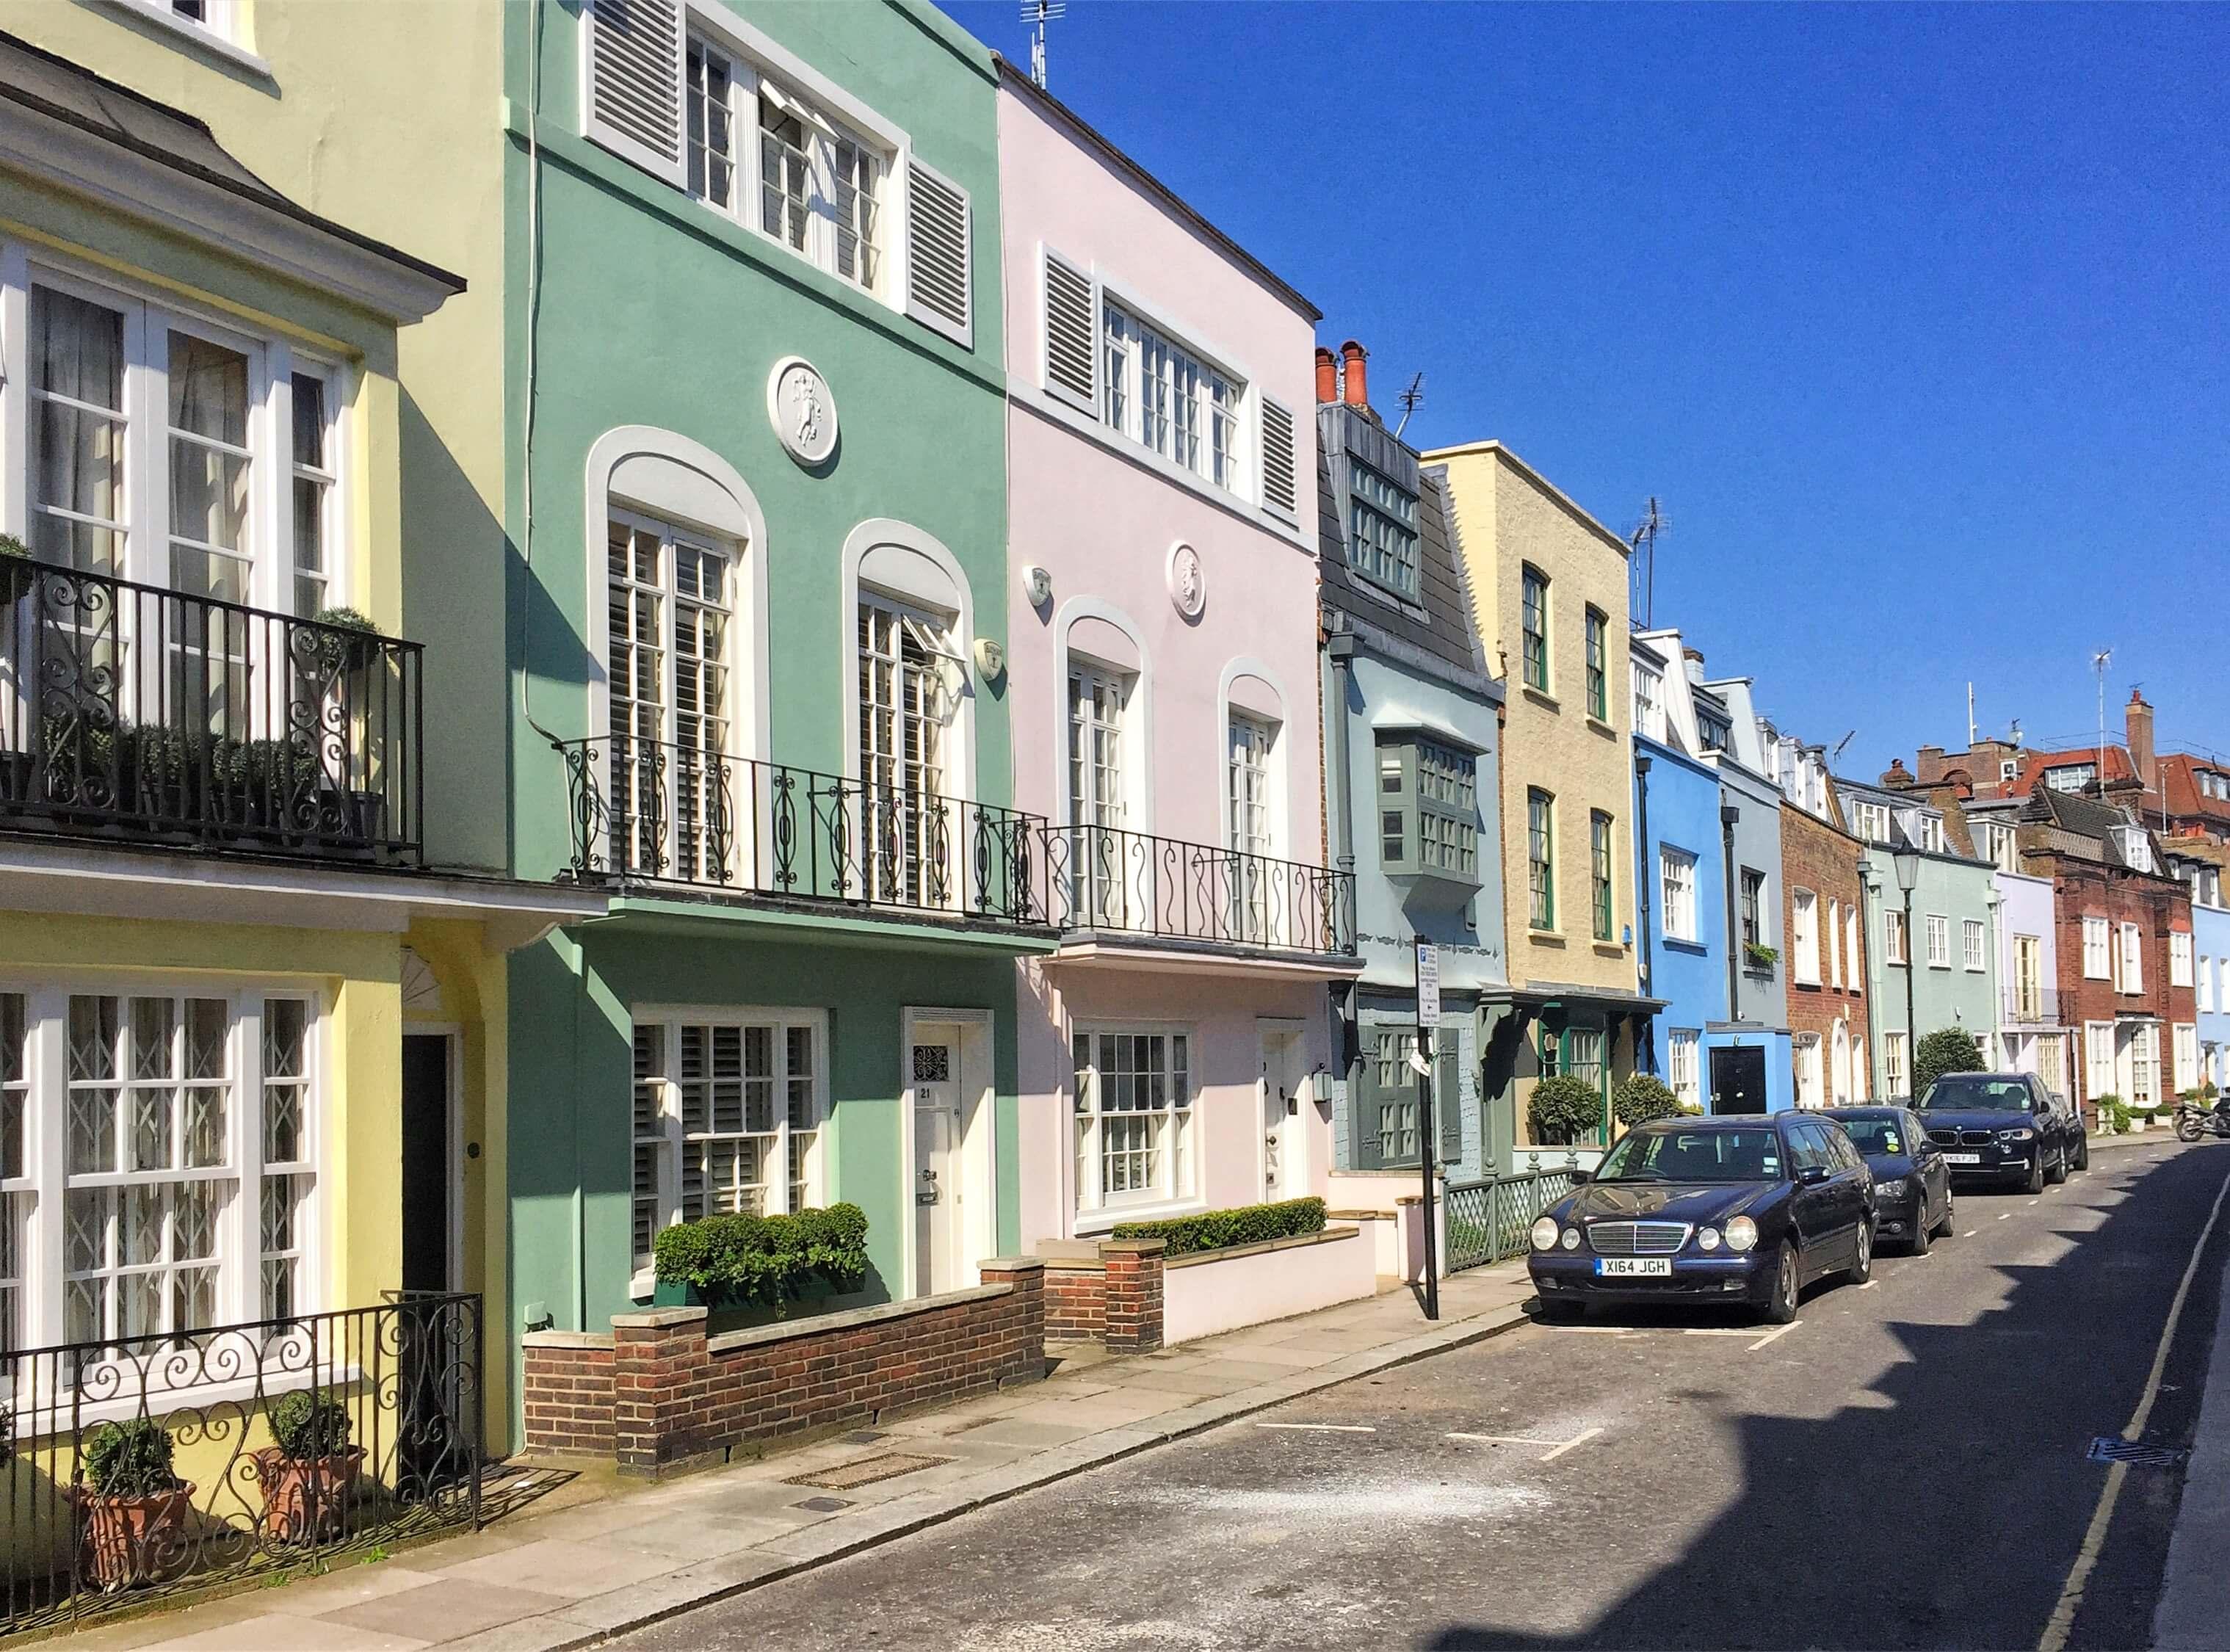 Godfrey Street, Chelsea, London